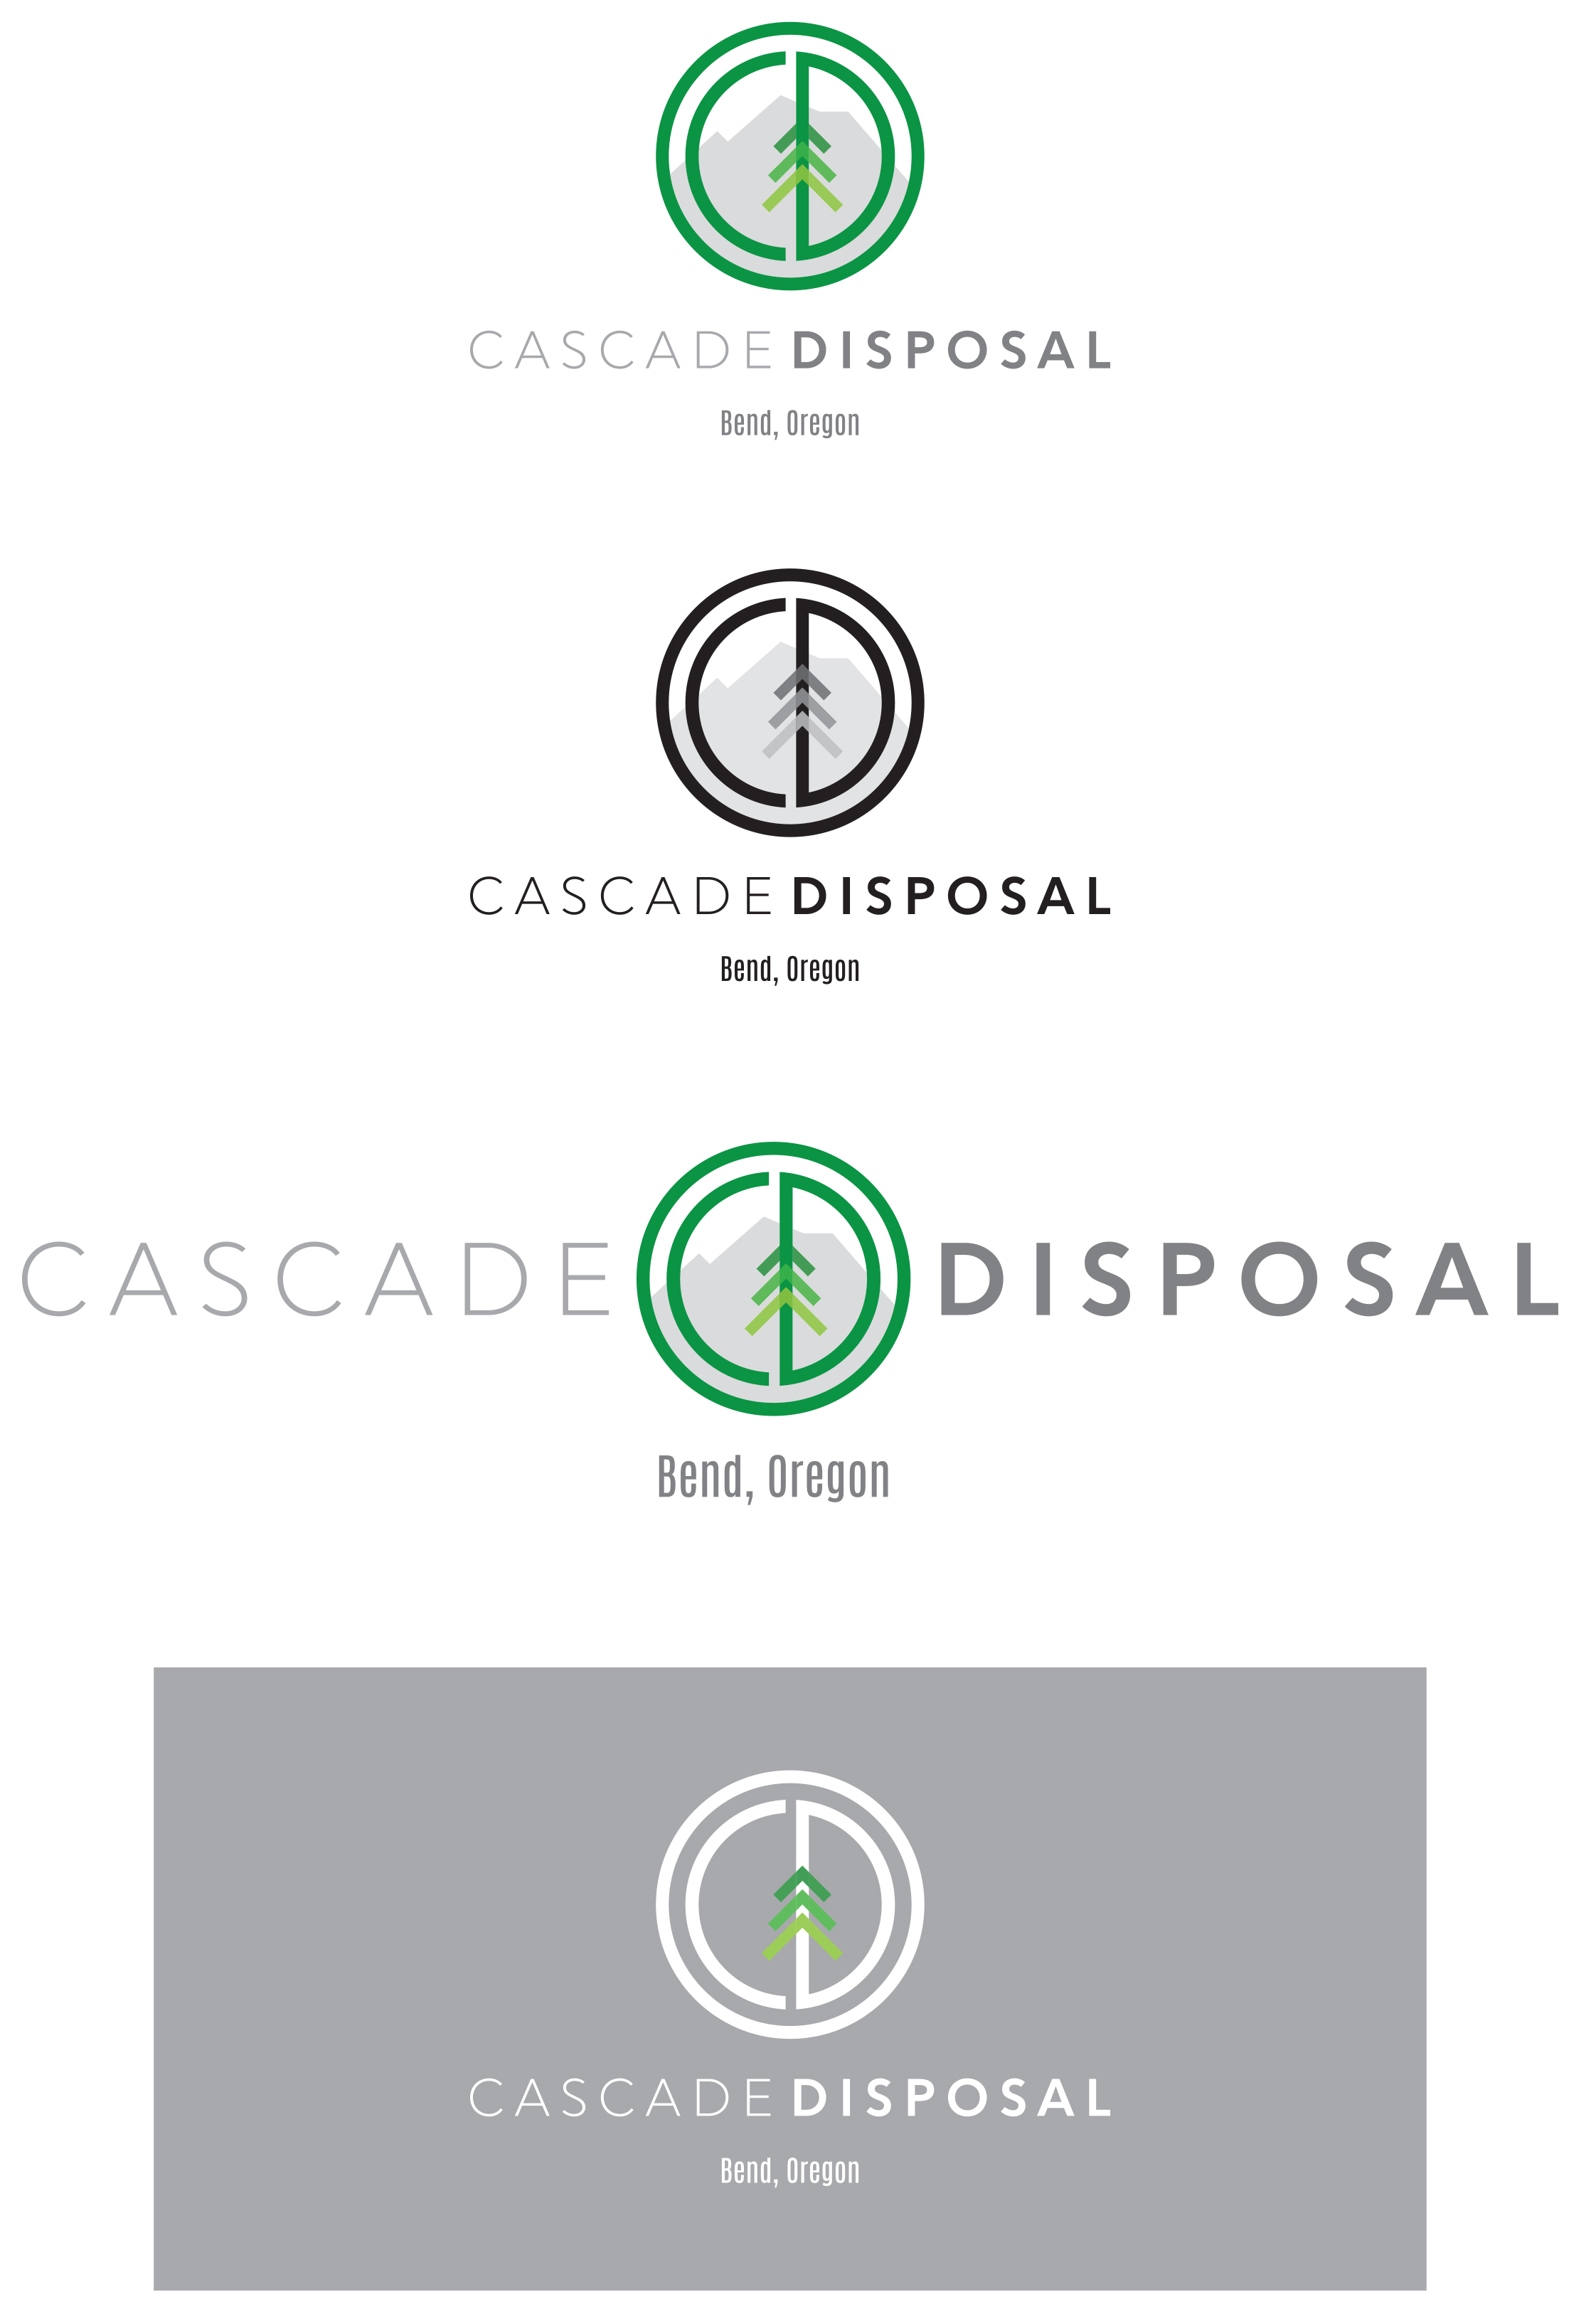 CascadeDisposal_submarks